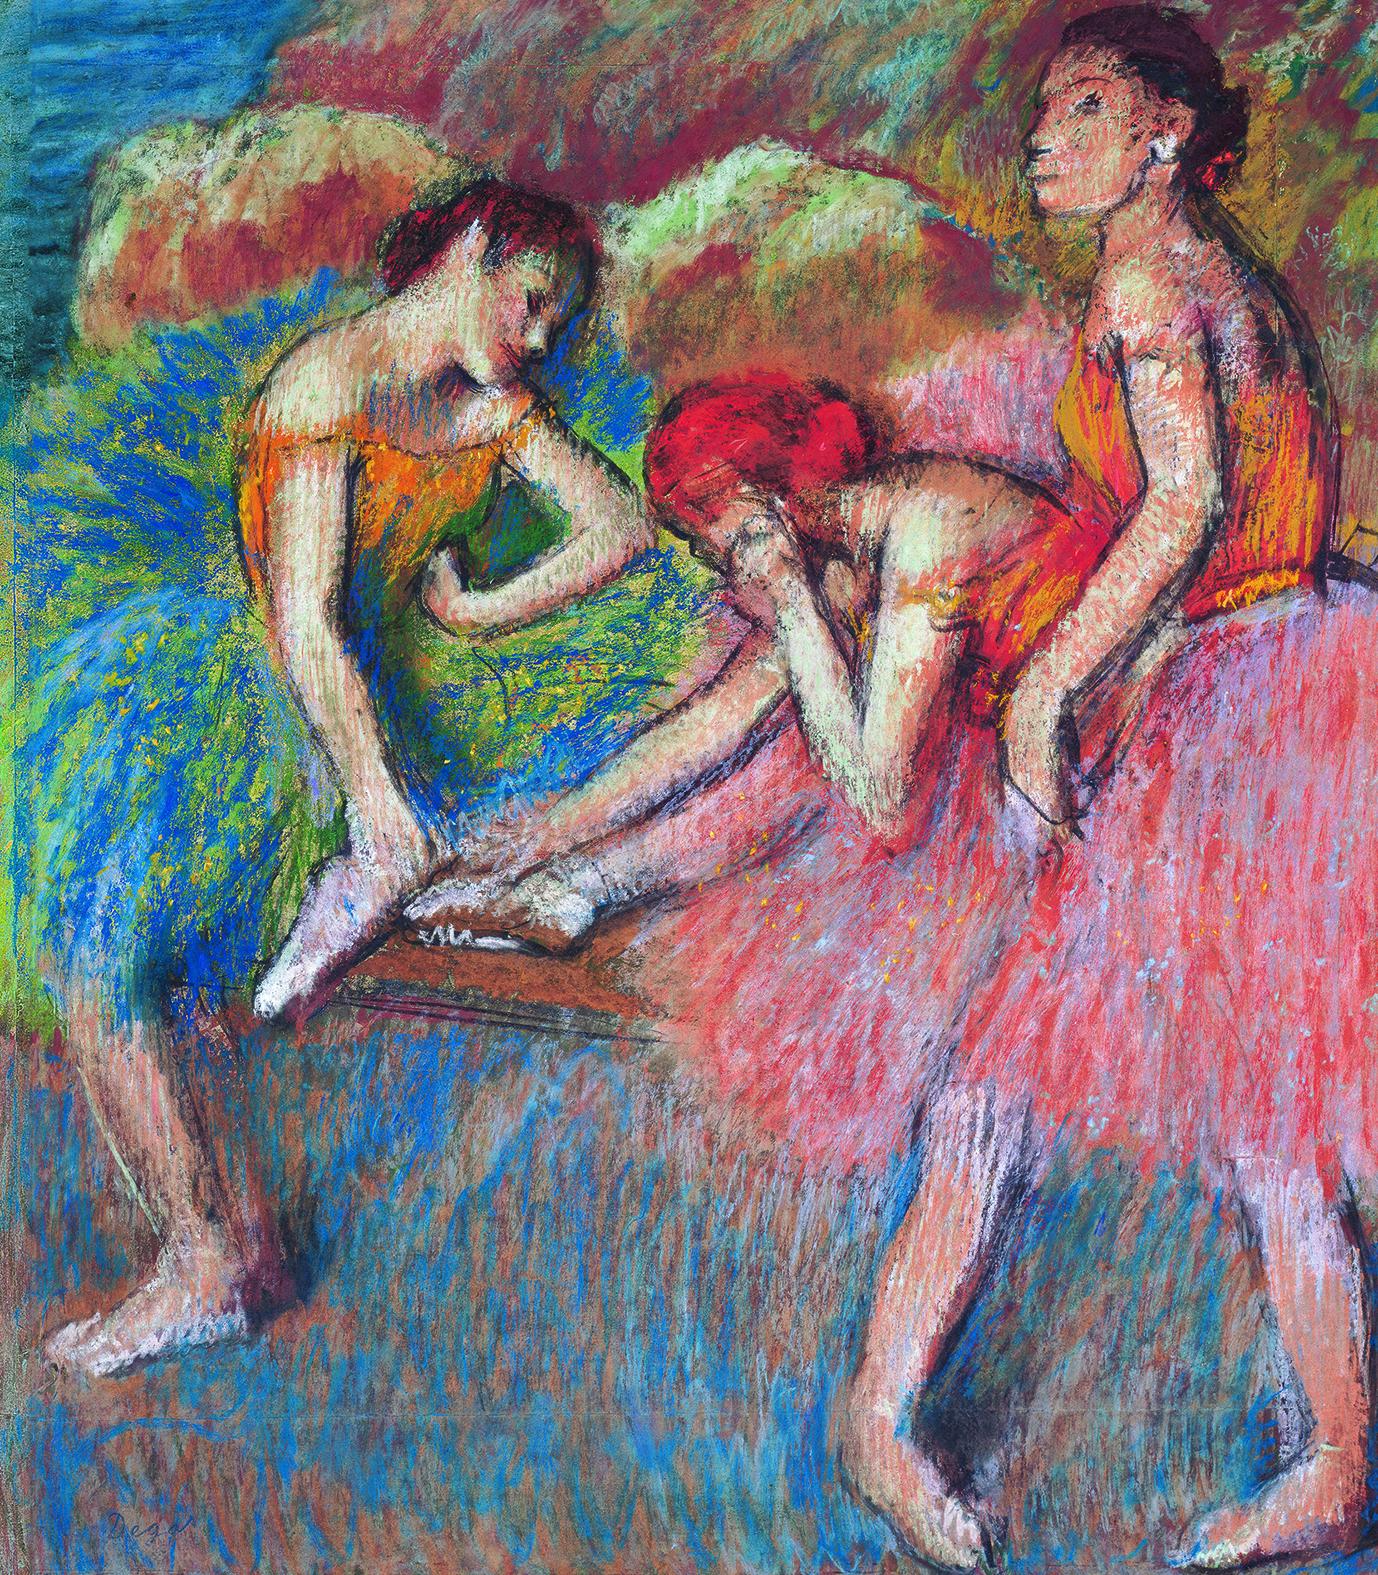 PASTELS_Degas_hd.jpg